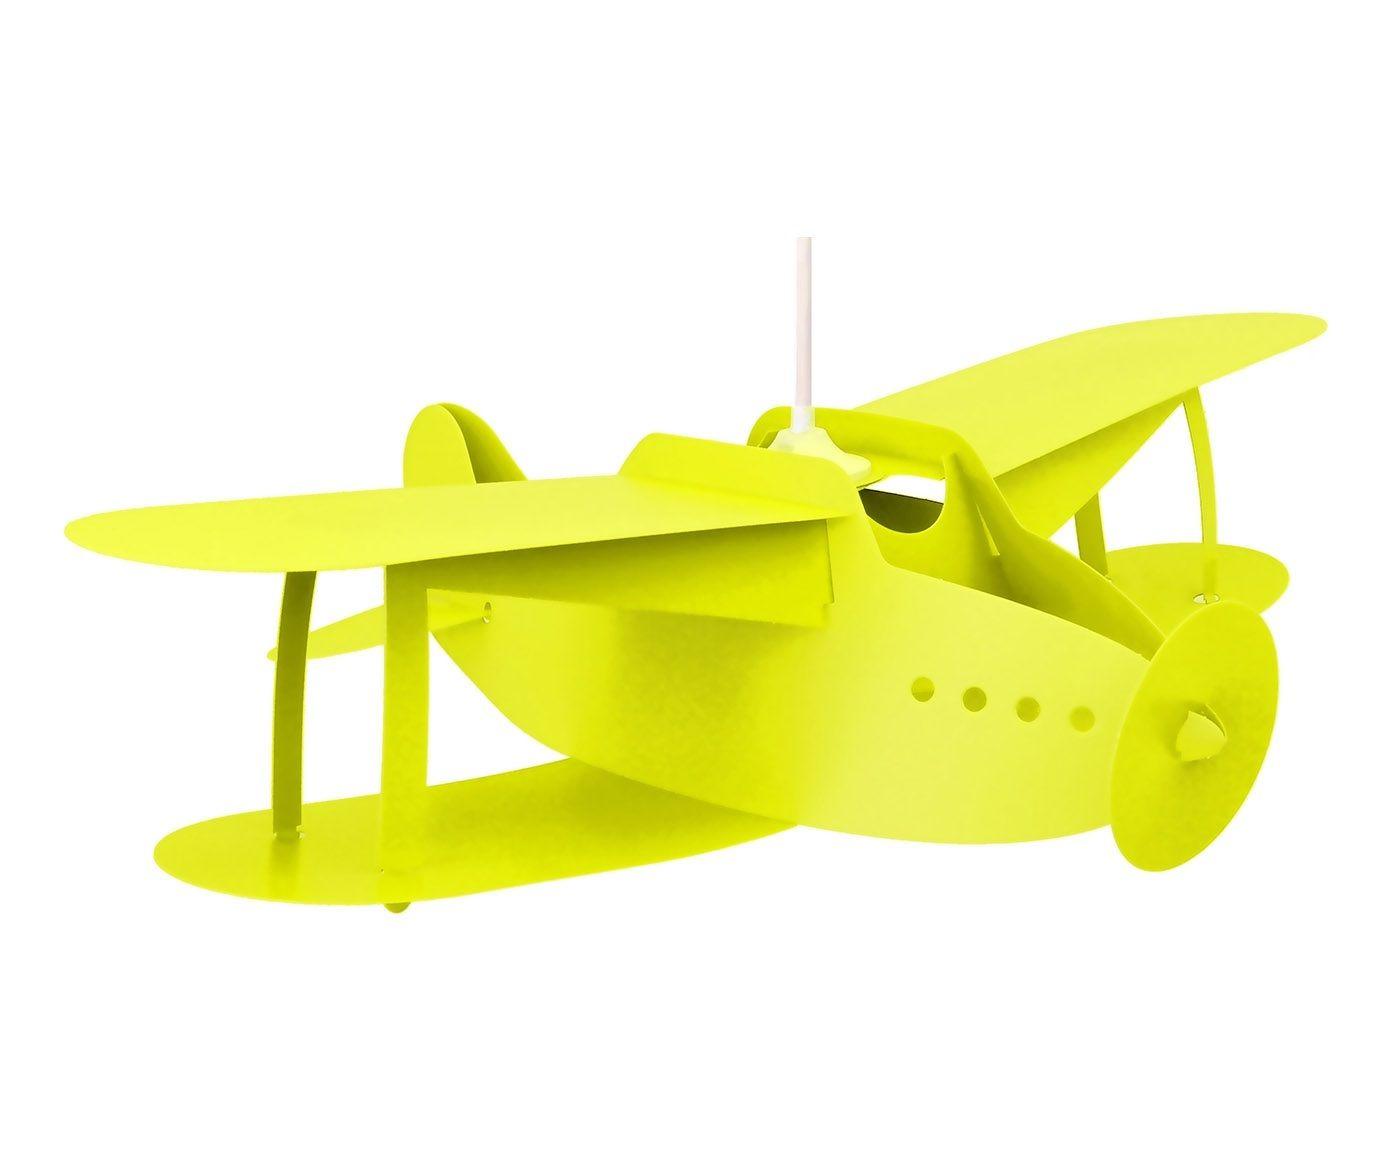 Suspension AVION priplak jaune genªt L50